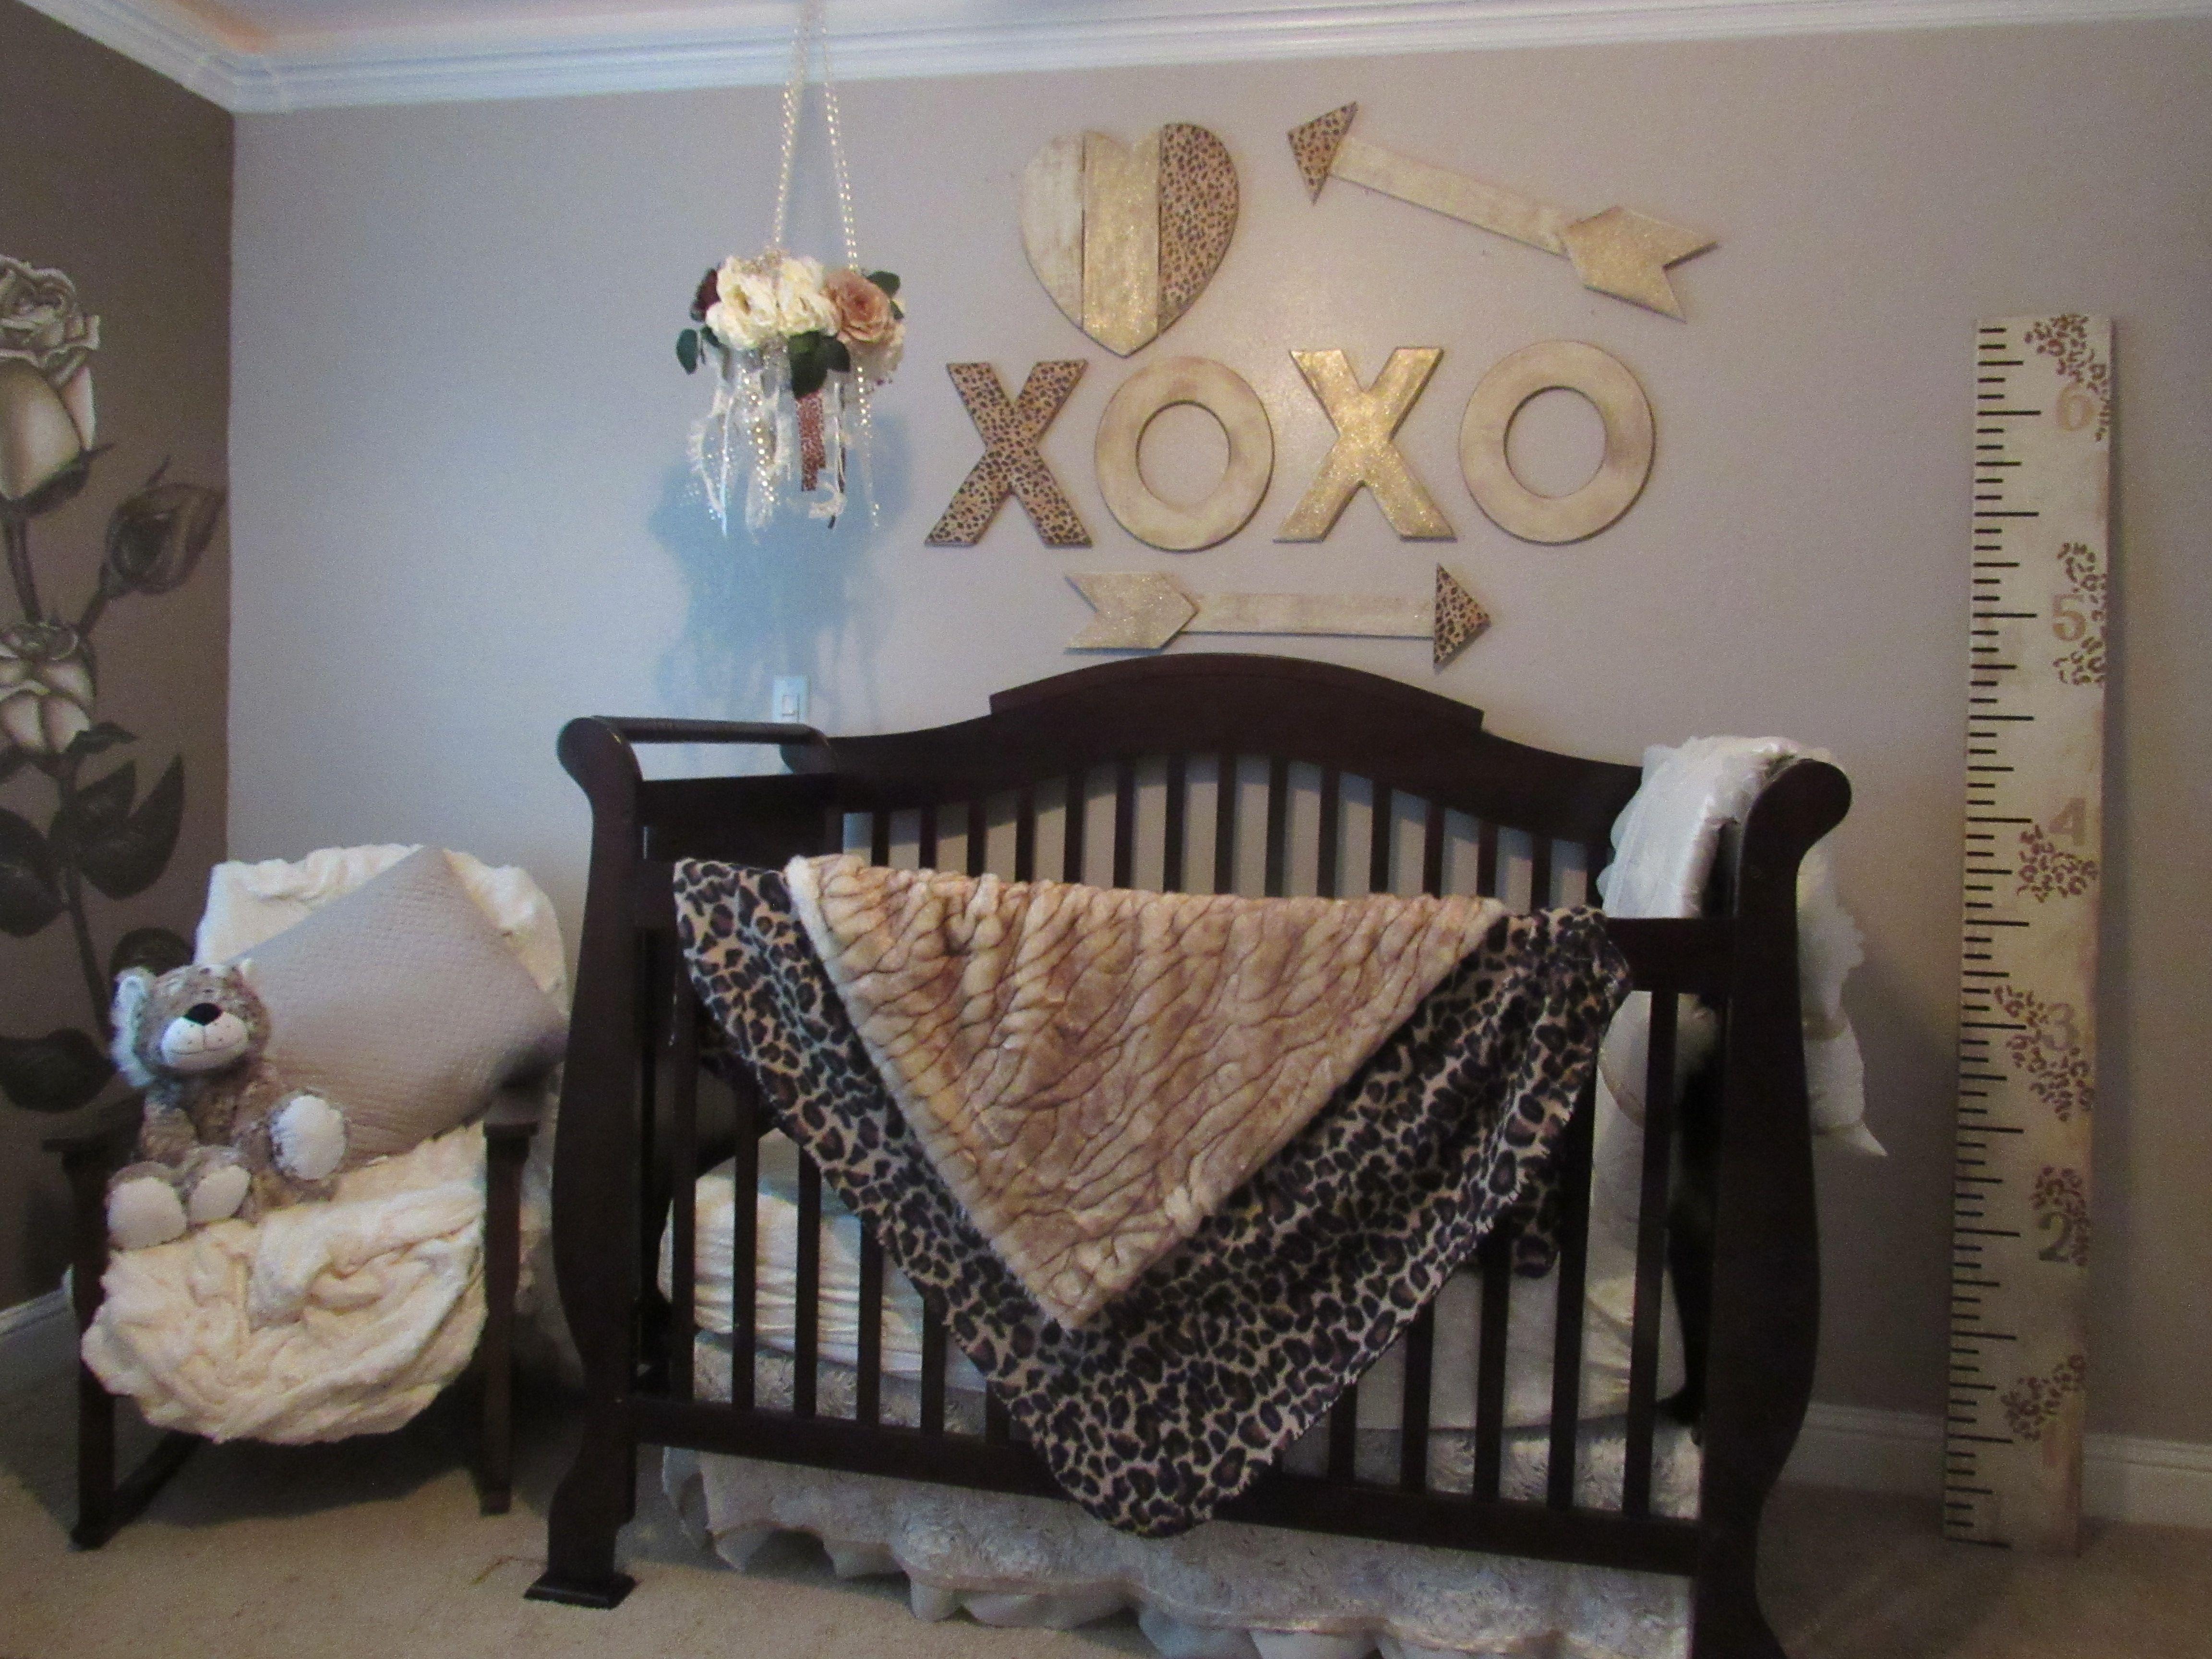 Rustic Shabby Chic Cheetah Girls Room Nursery Girls Nursery Home Decor Nursery Decor Nursery Decor Decor Baby Room Decor